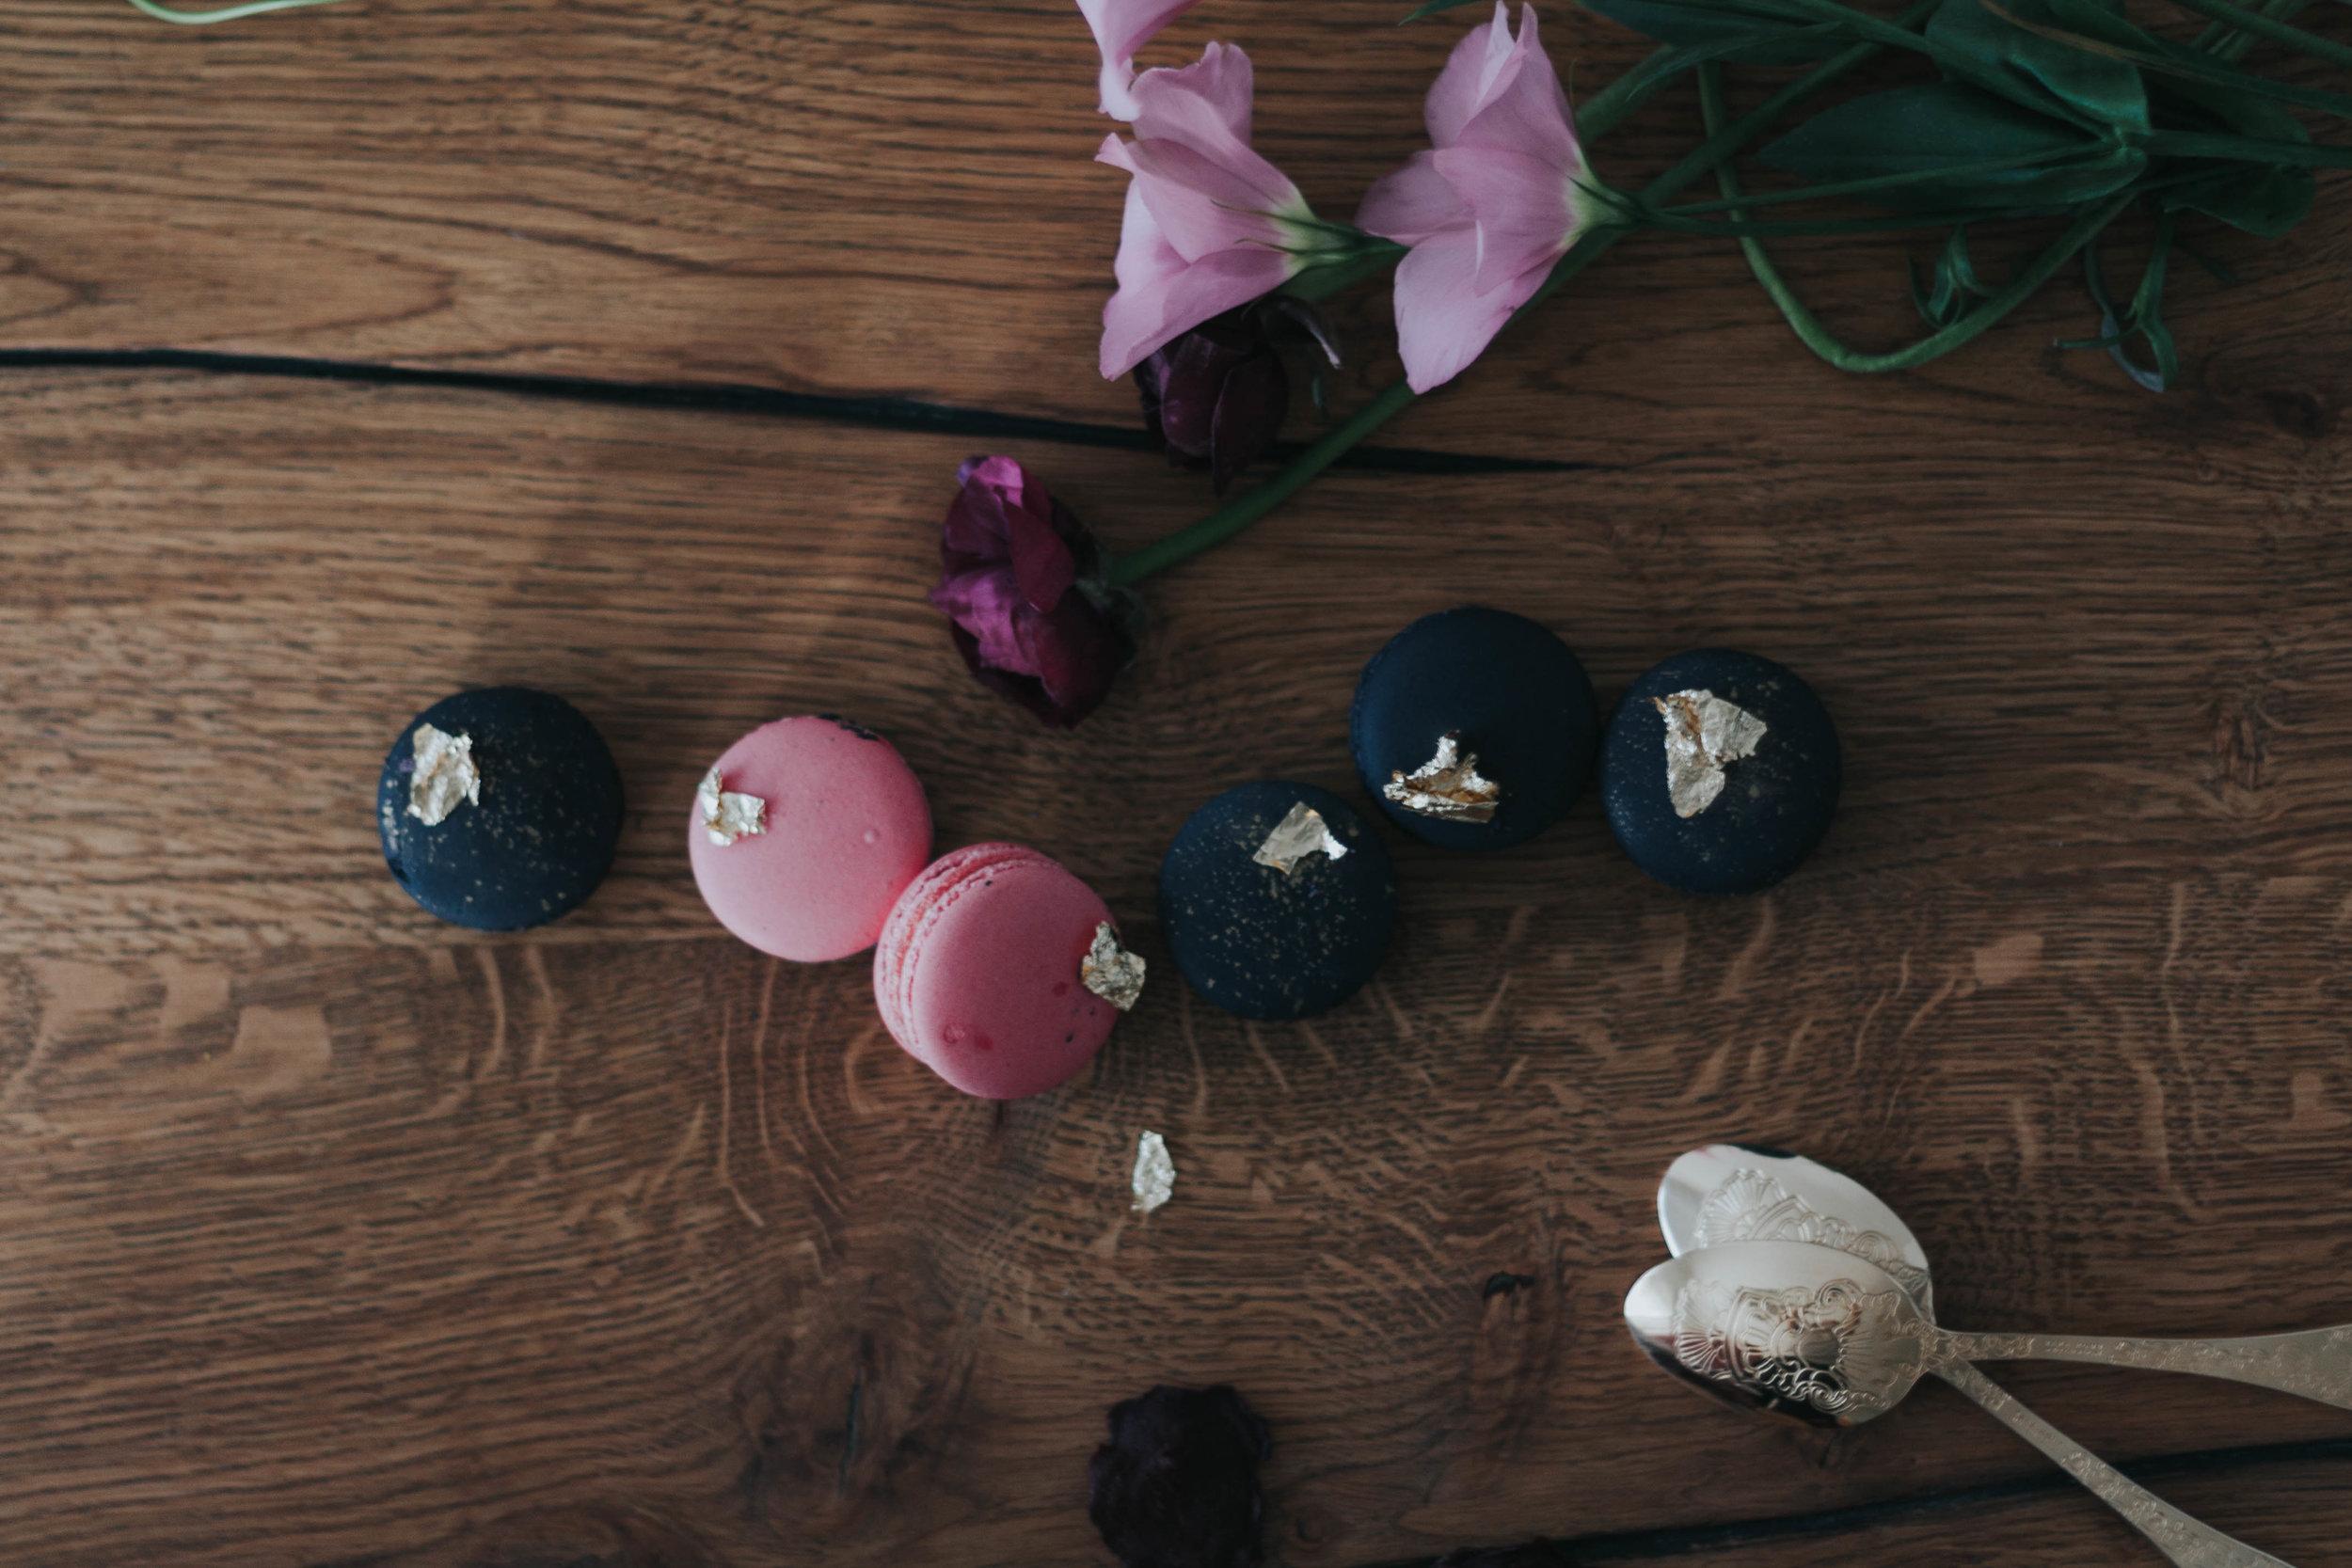 Macaron diverse Farben